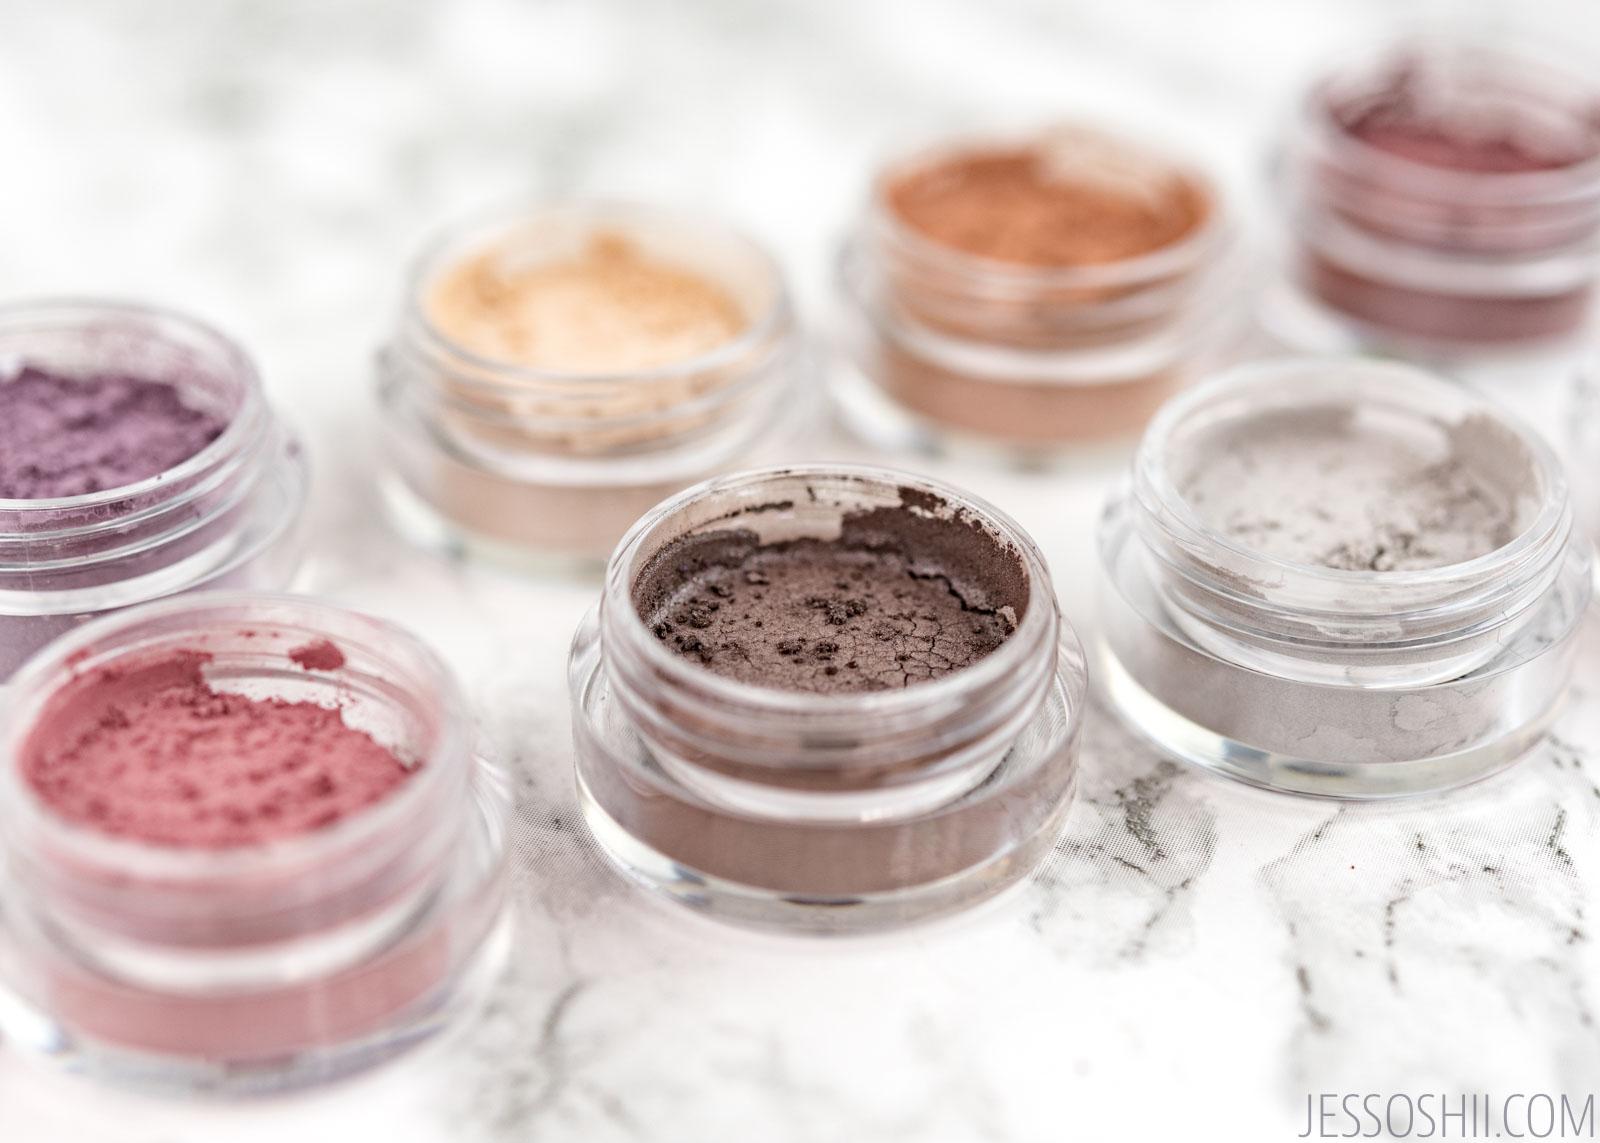 How to do sensitive eye make-up?